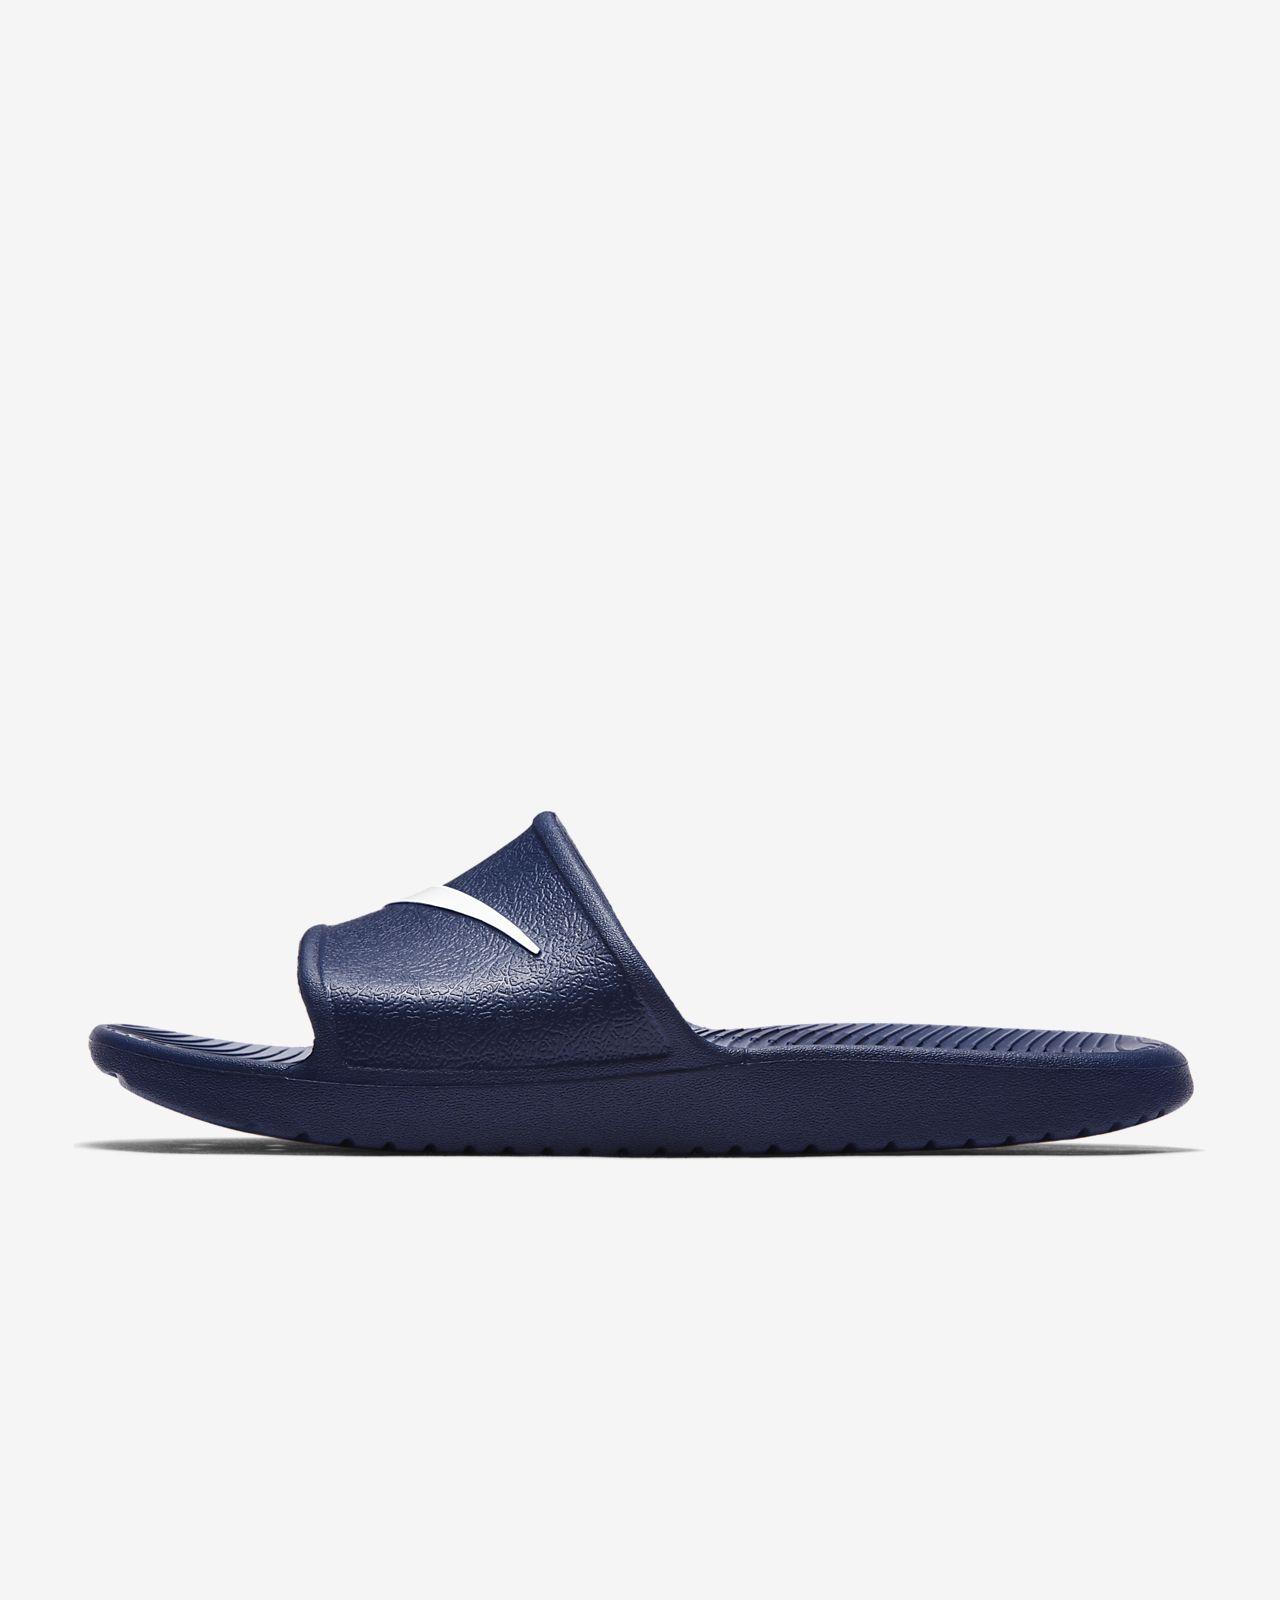 big discount popular brand new specials Nike Kawa Shower Chanclas - Hombre